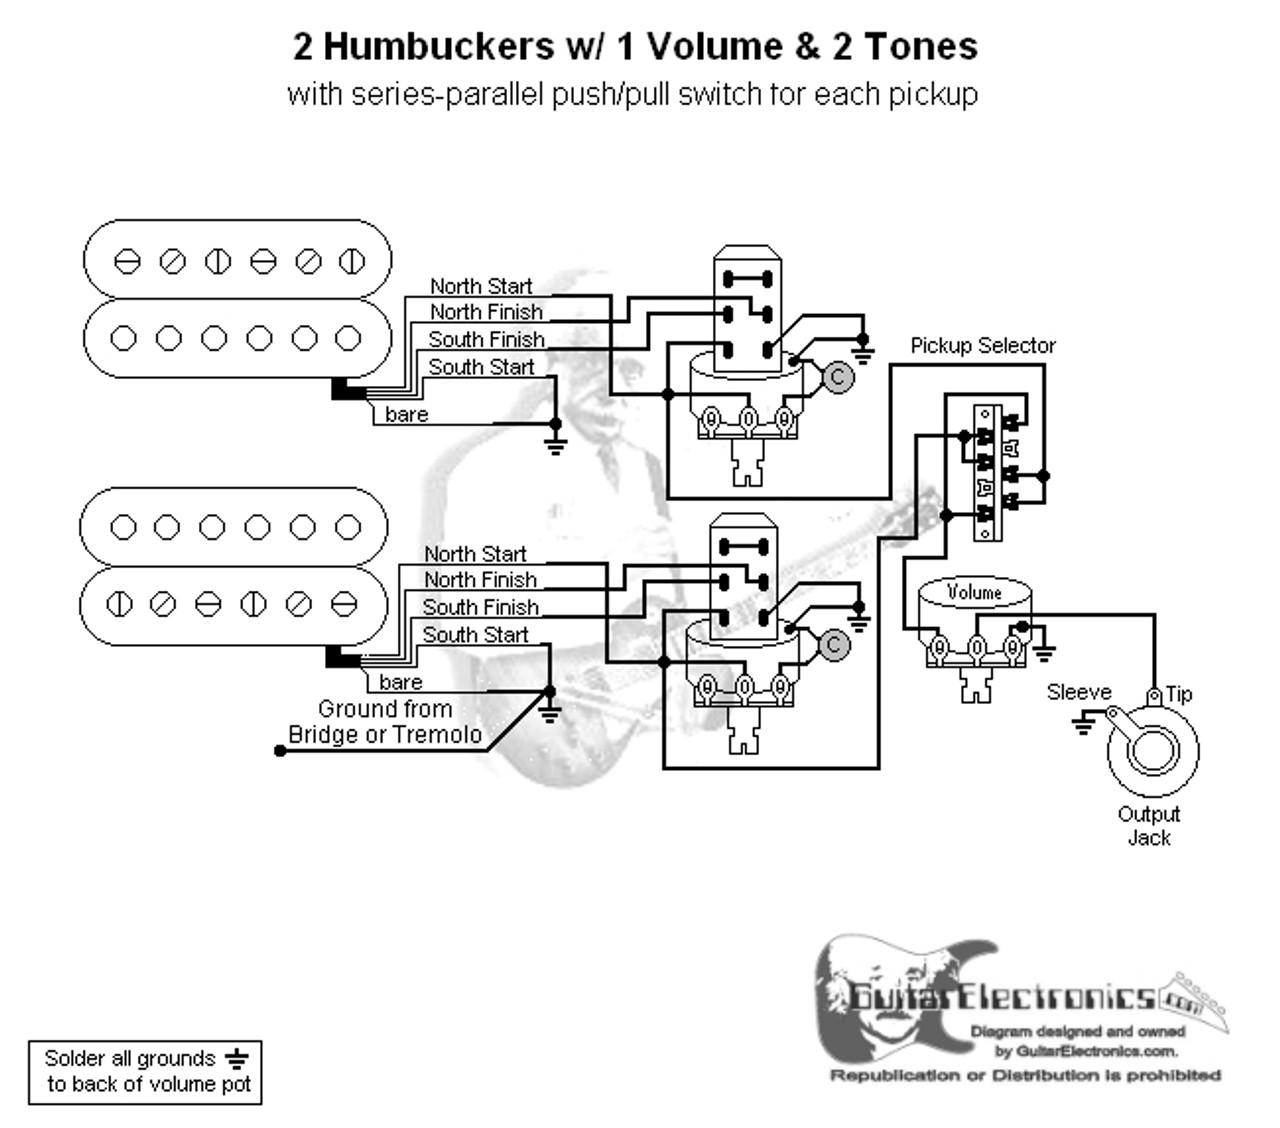 2 humbuckers 3 way lever switch 1 volume 2 tones series parallelwd2hh3l12_04__20698 1470694267 jpg?c\u003d2